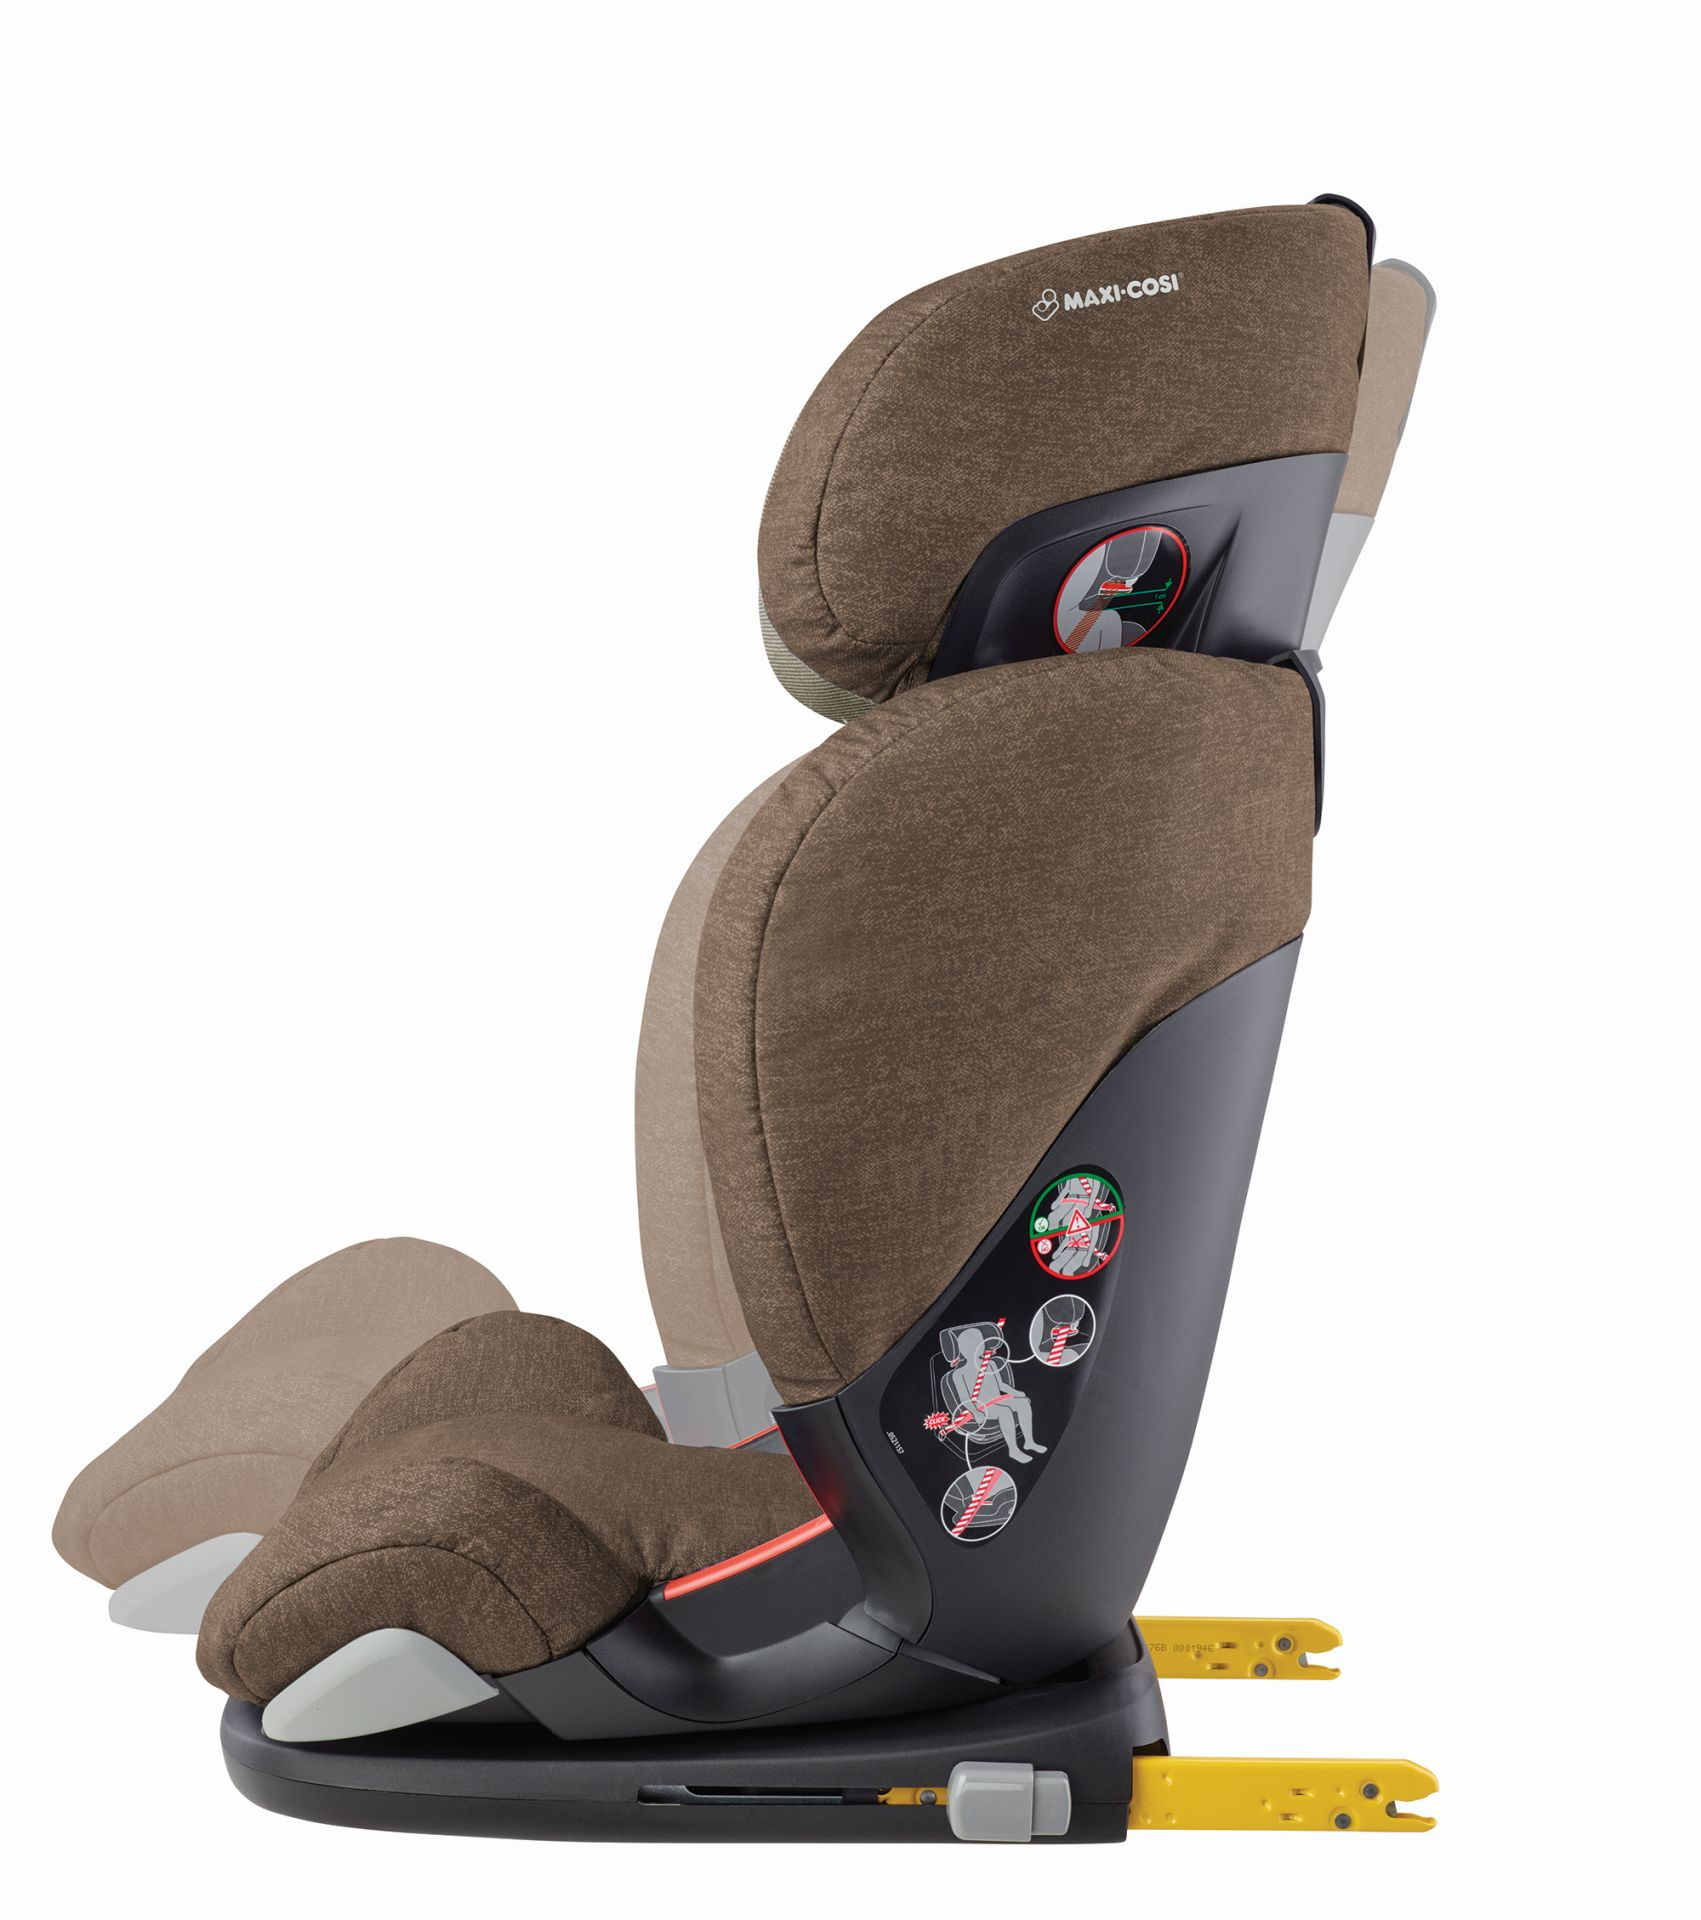 Maxi Cosi Airprotect : maxi cosi child car seat rodifix airprotect 2018 nomad brown buy at kidsroom car seats ~ Watch28wear.com Haus und Dekorationen